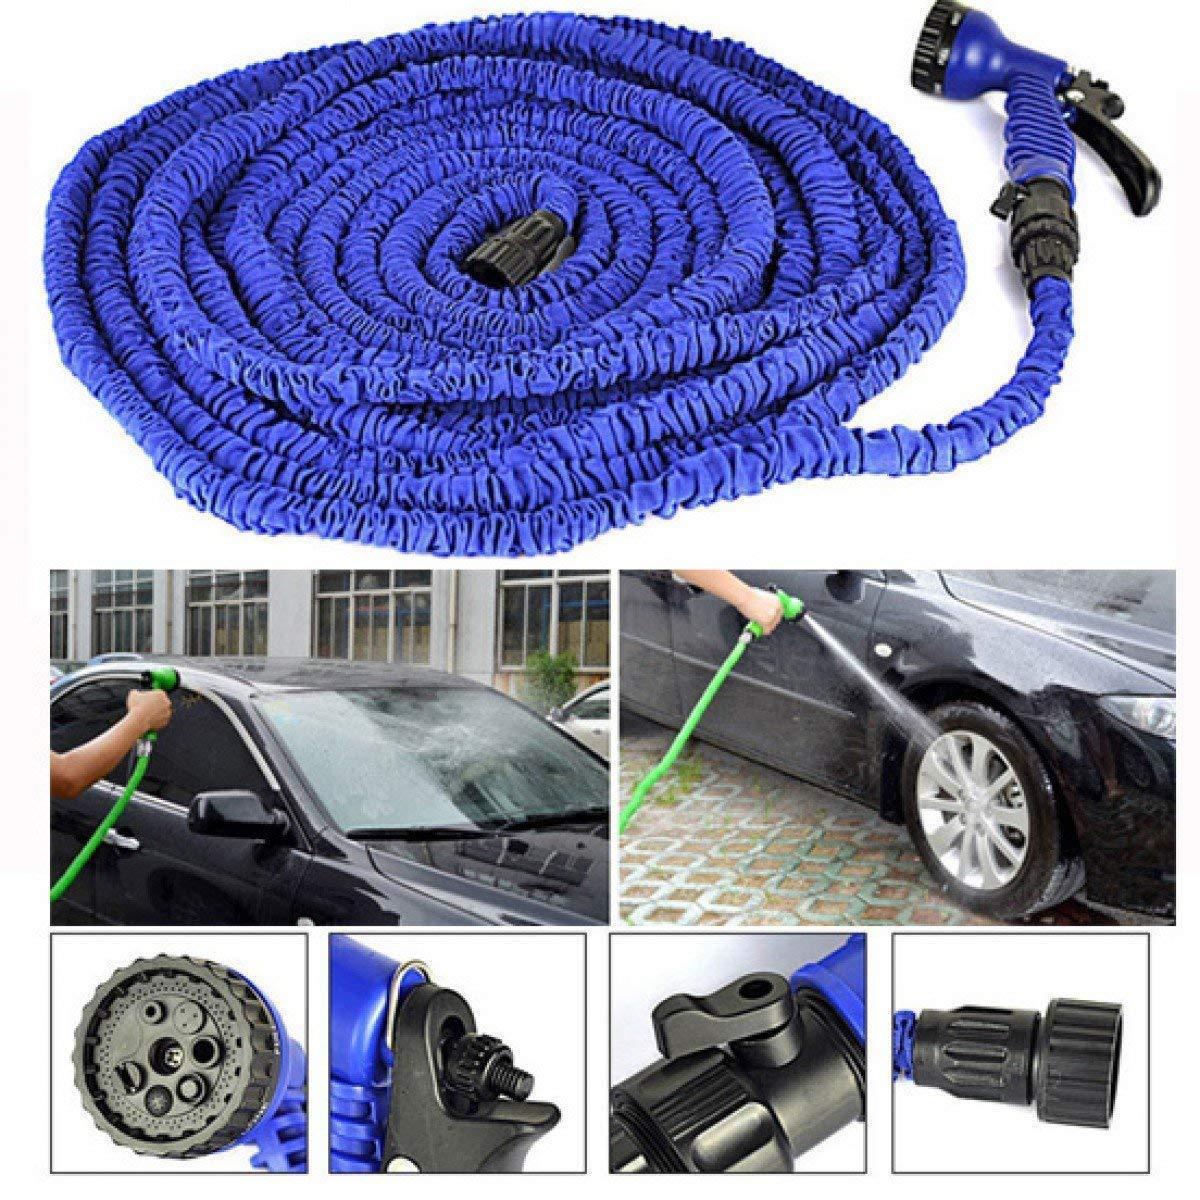 50 Ft Expandable Hose Pipe Nozzle For Garden Wash Car Bike With Spray Gun - Unnati Enterprises